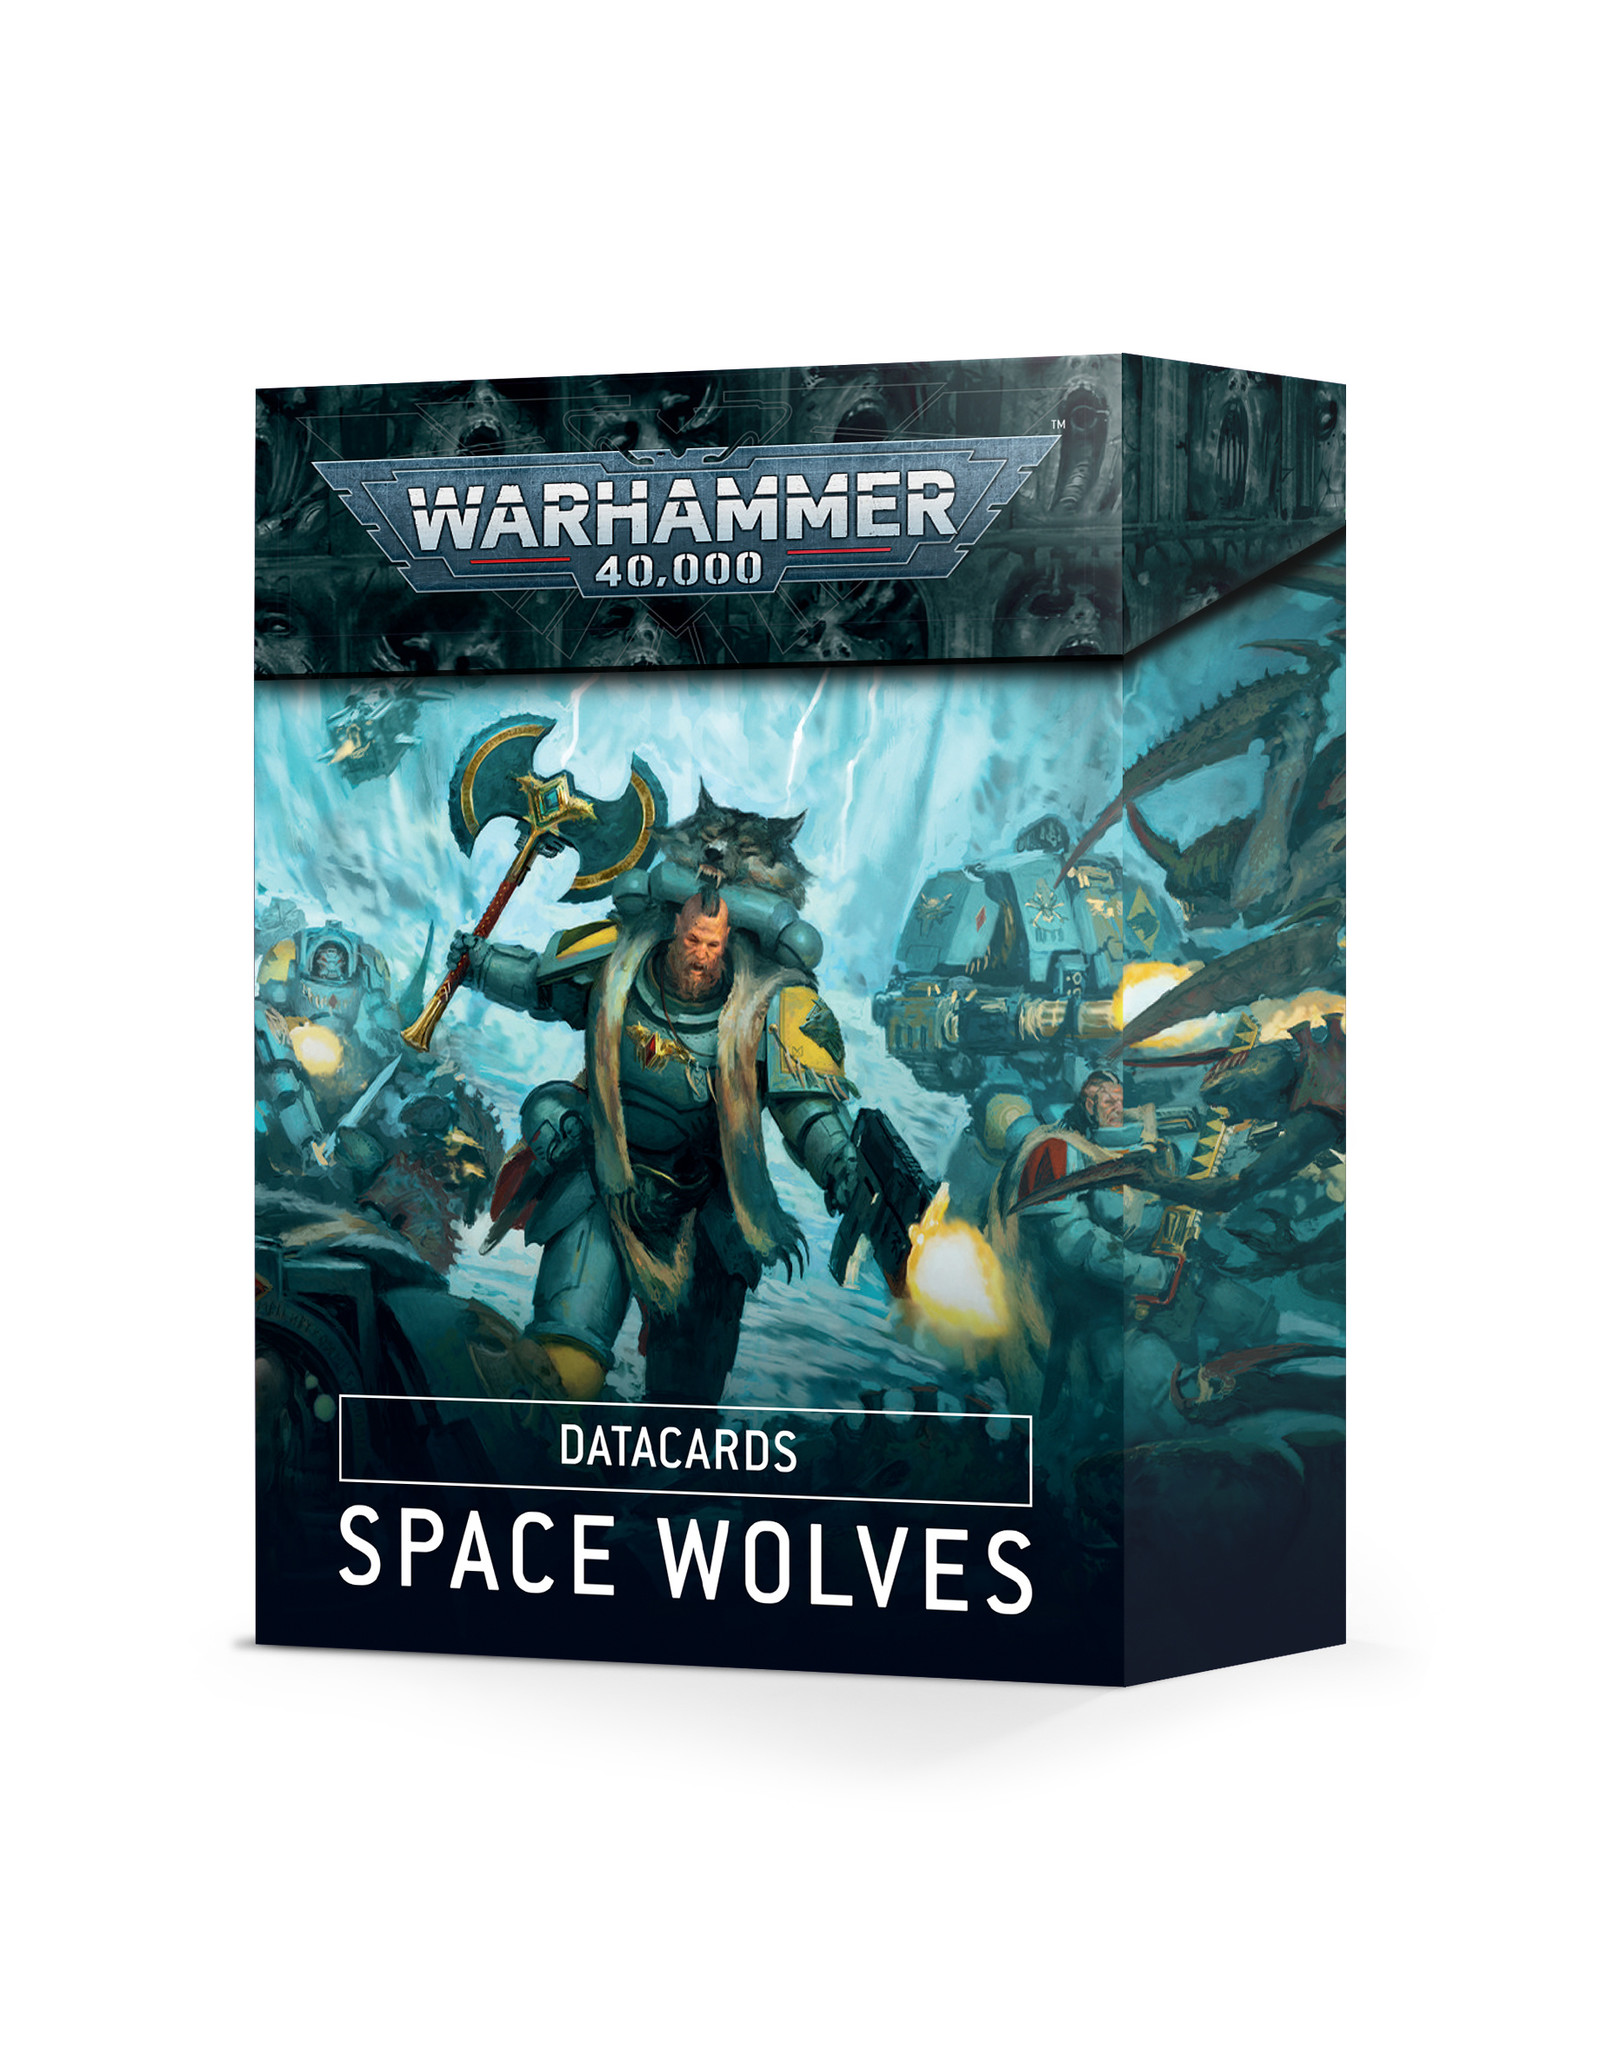 Warhammer 40K Datacards: Space Wolves